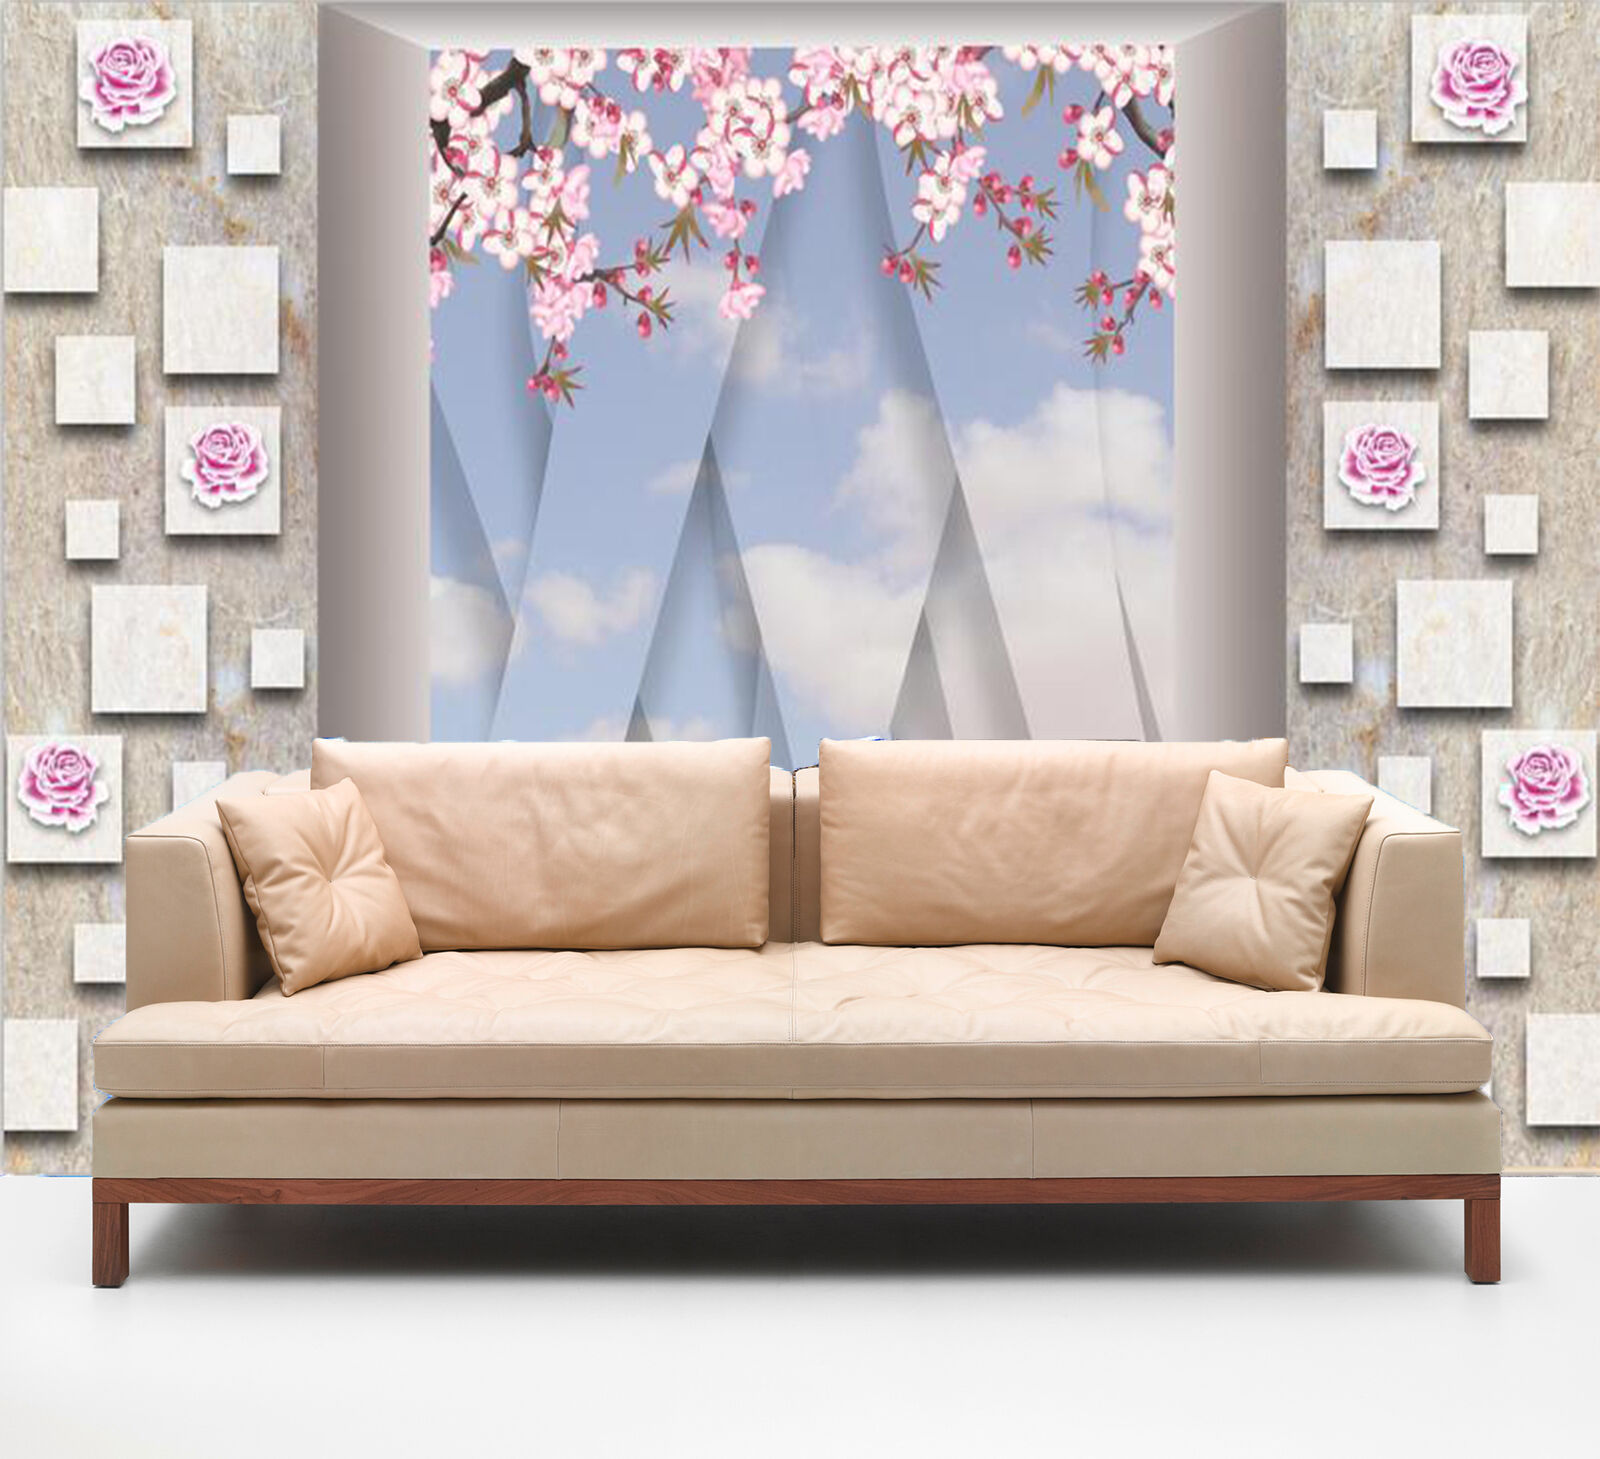 3D Flowers And Patterns 485 Wallpaper Decal Dercor Home Kids Nursery Mural  Home